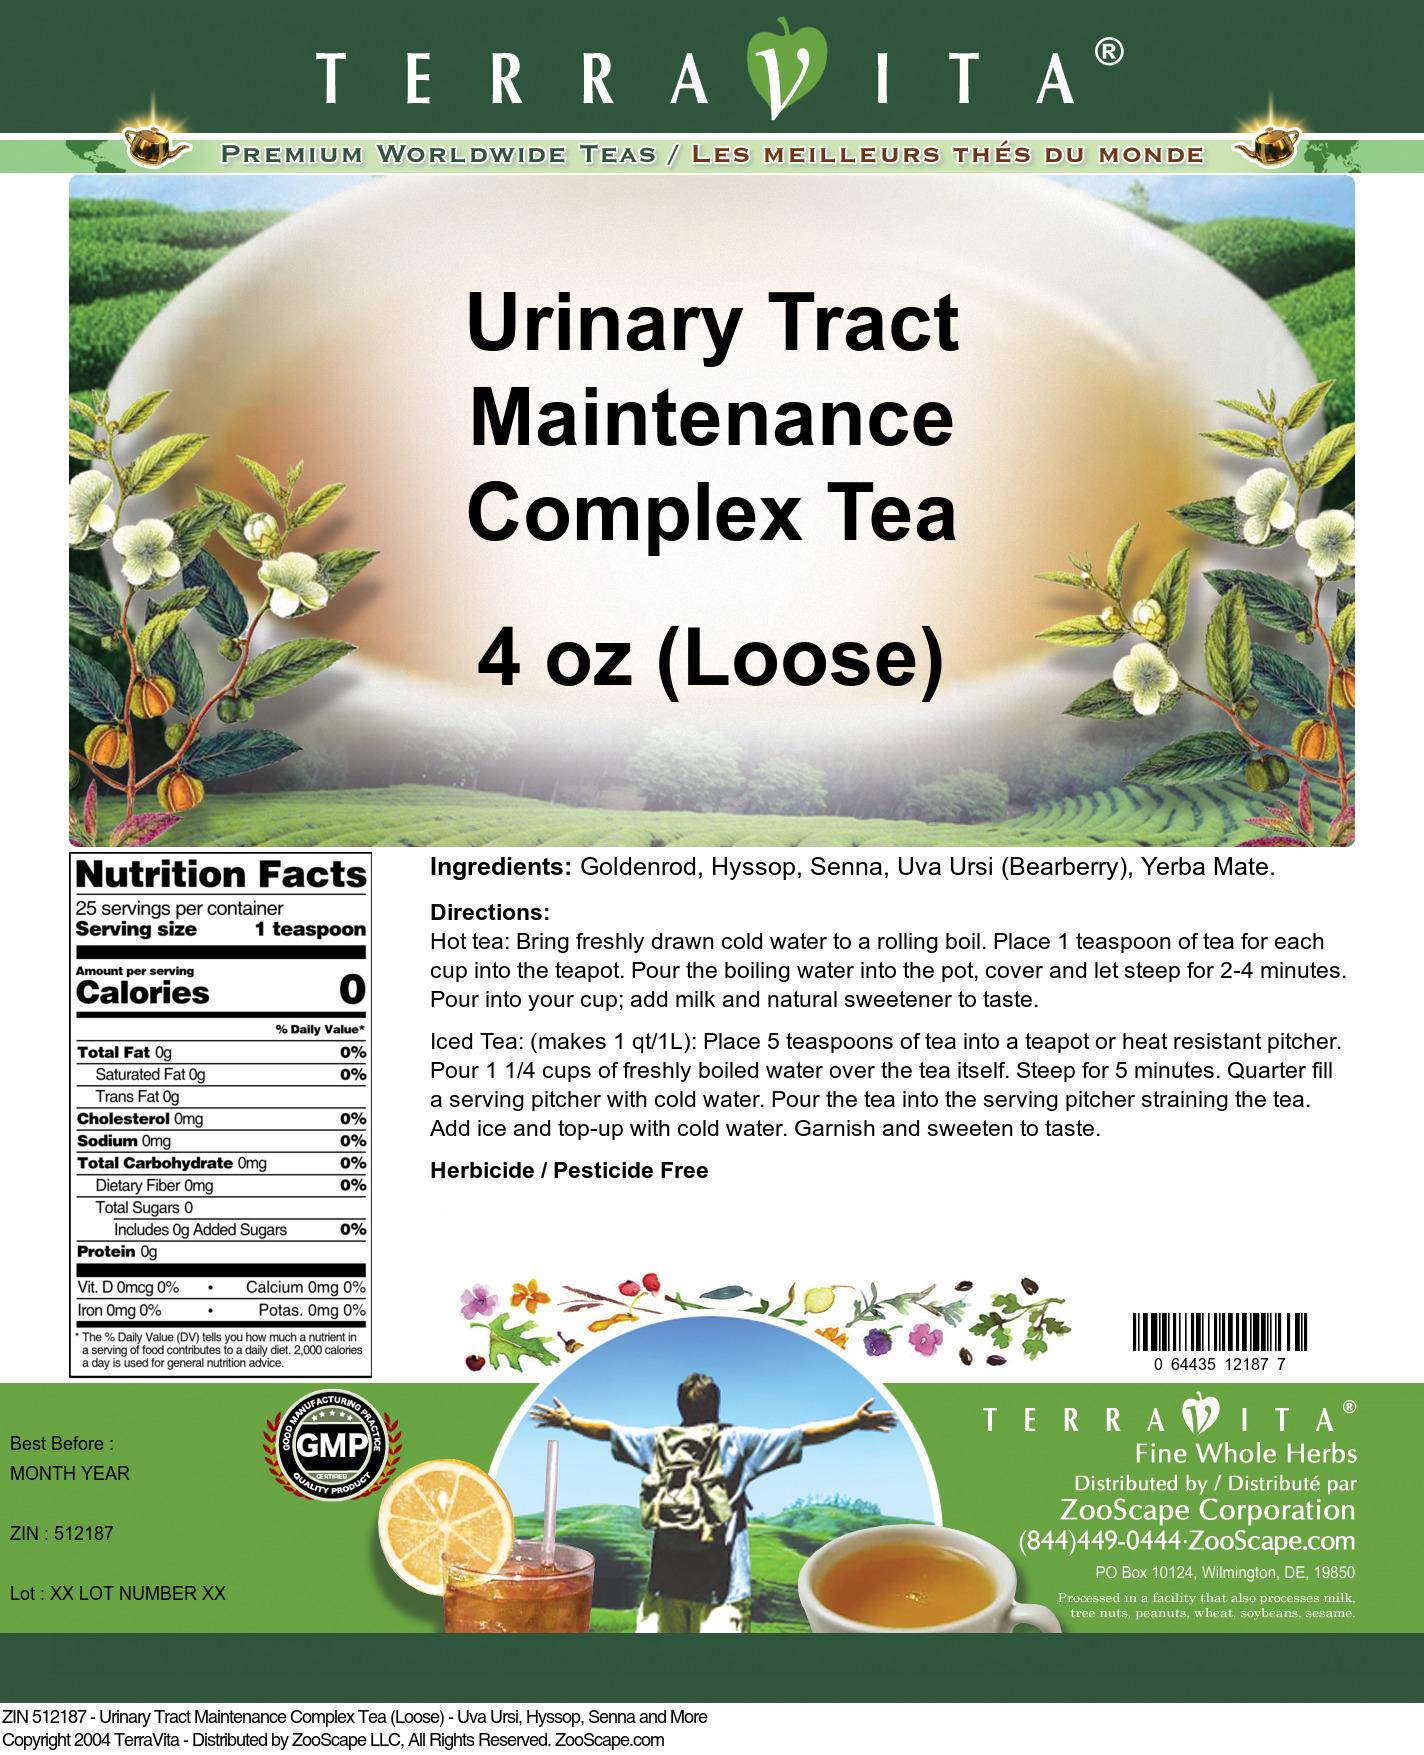 Urinary Tract Maintenance Complex